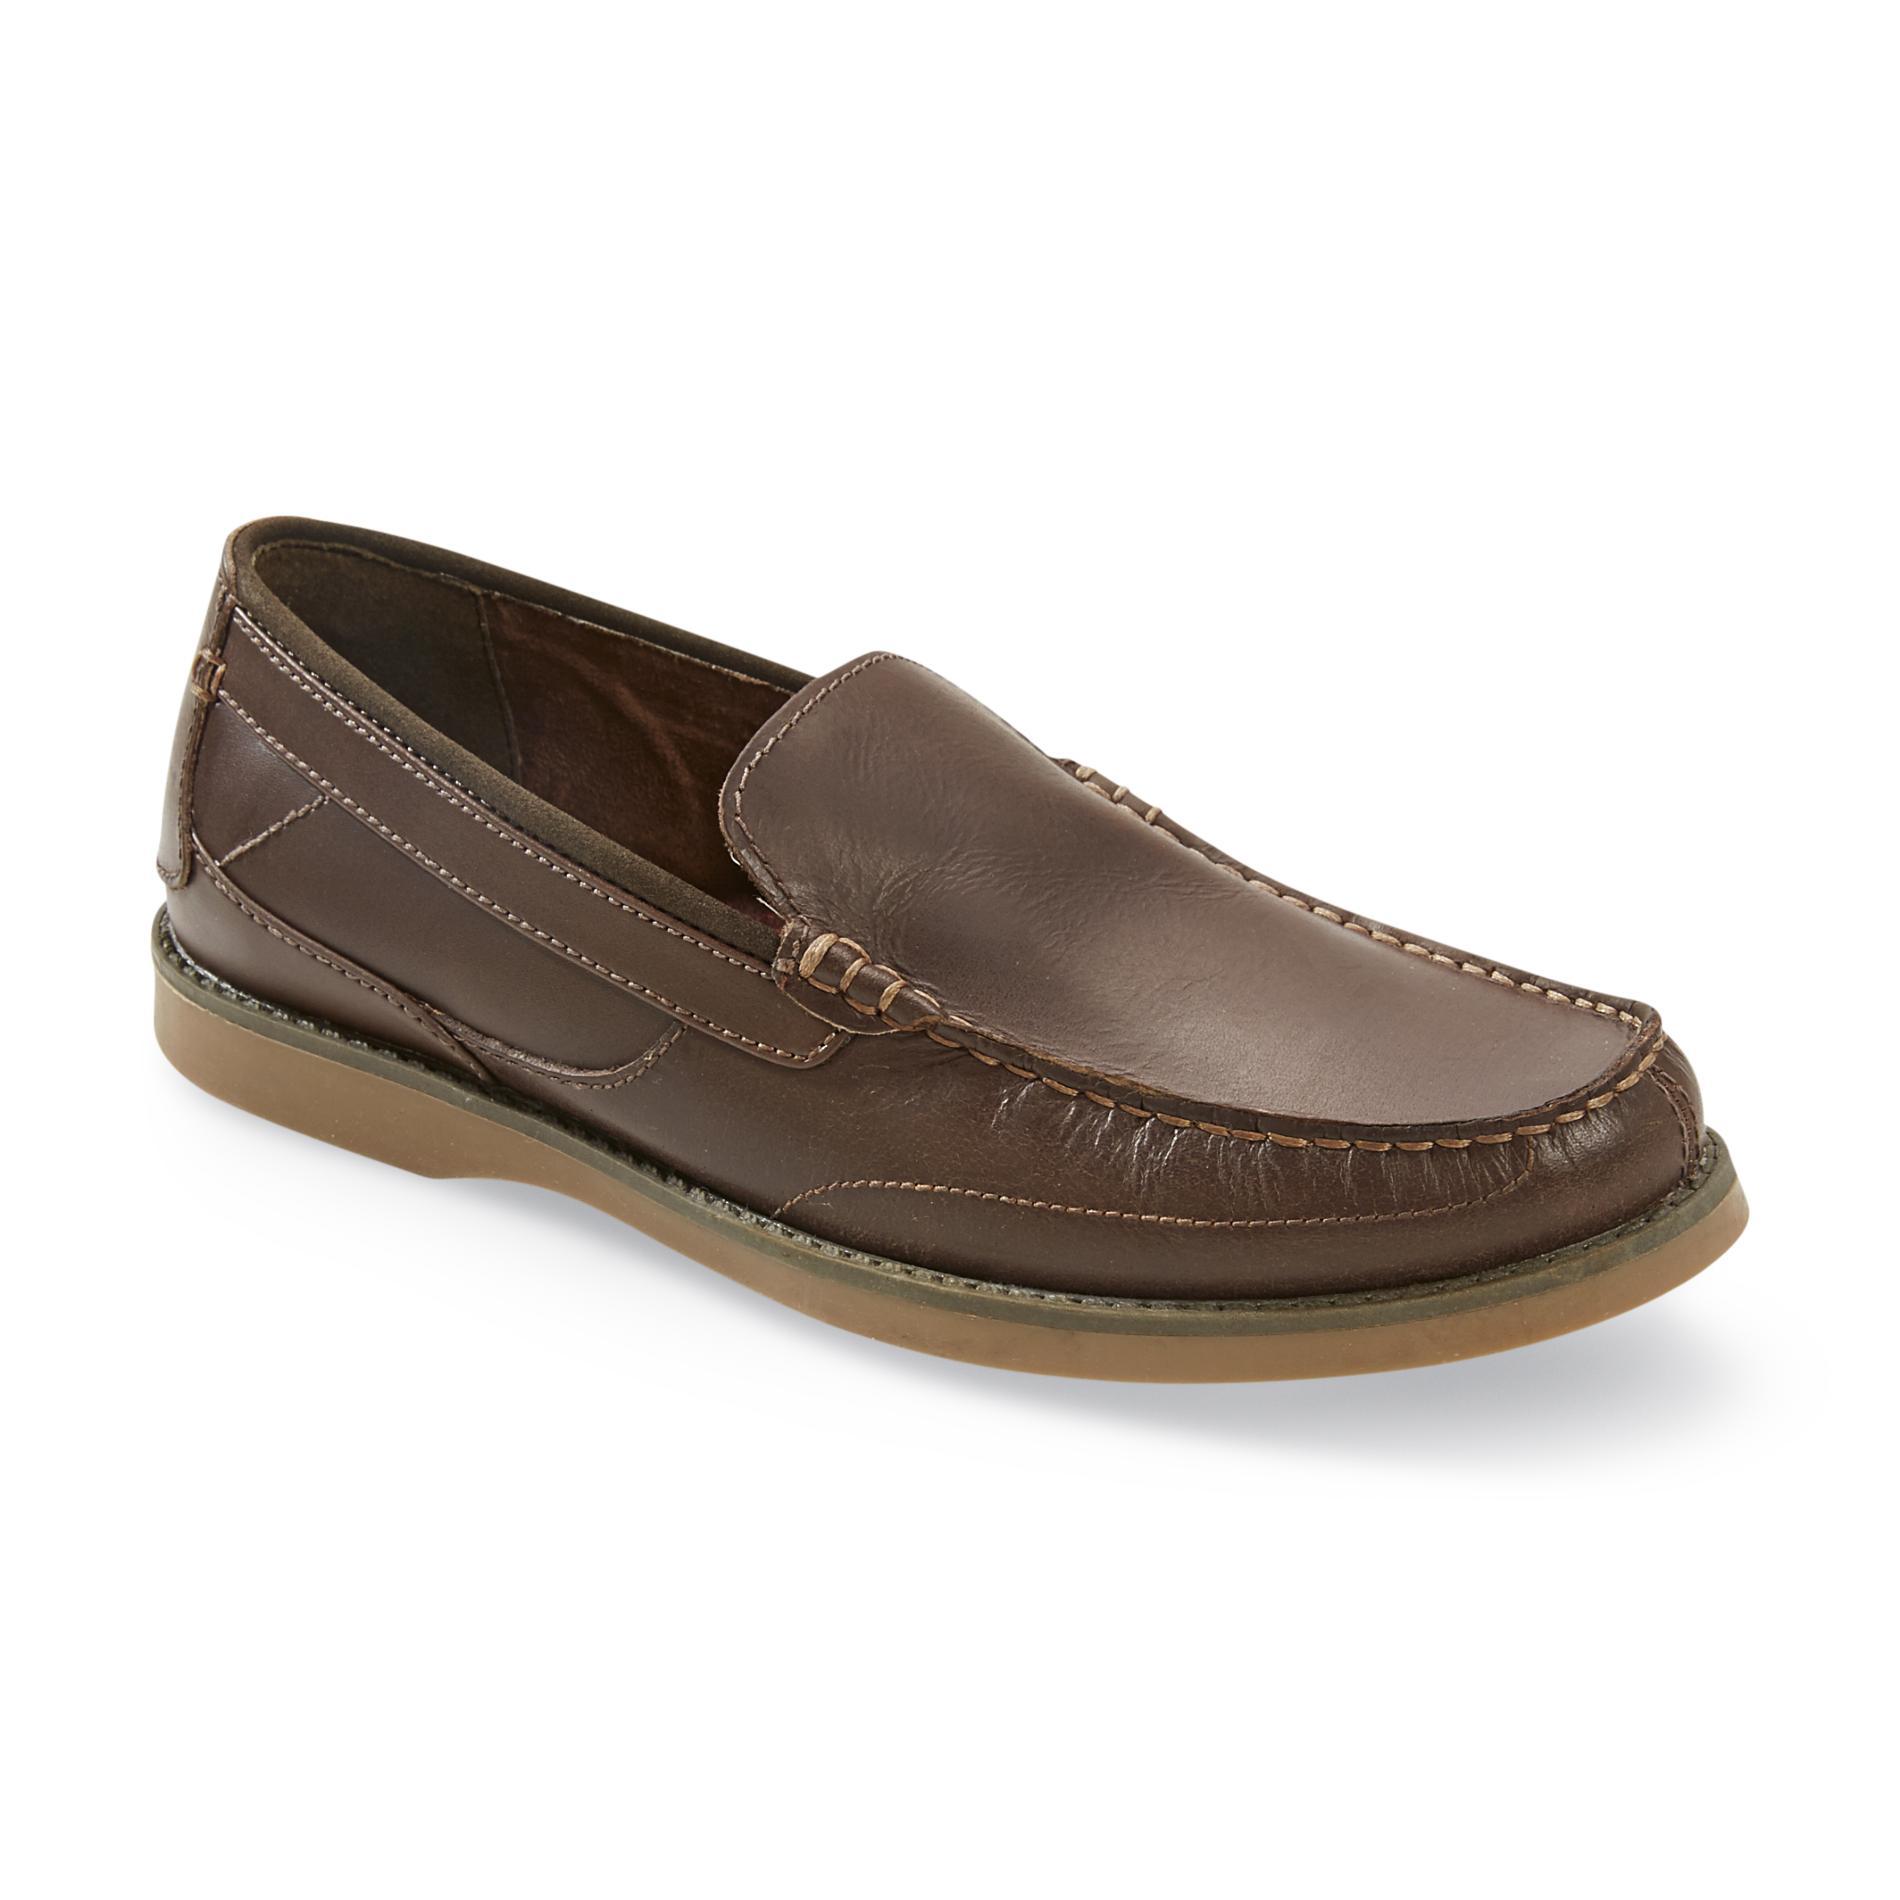 Nunn Bush Men's Luddington Brown Loafer